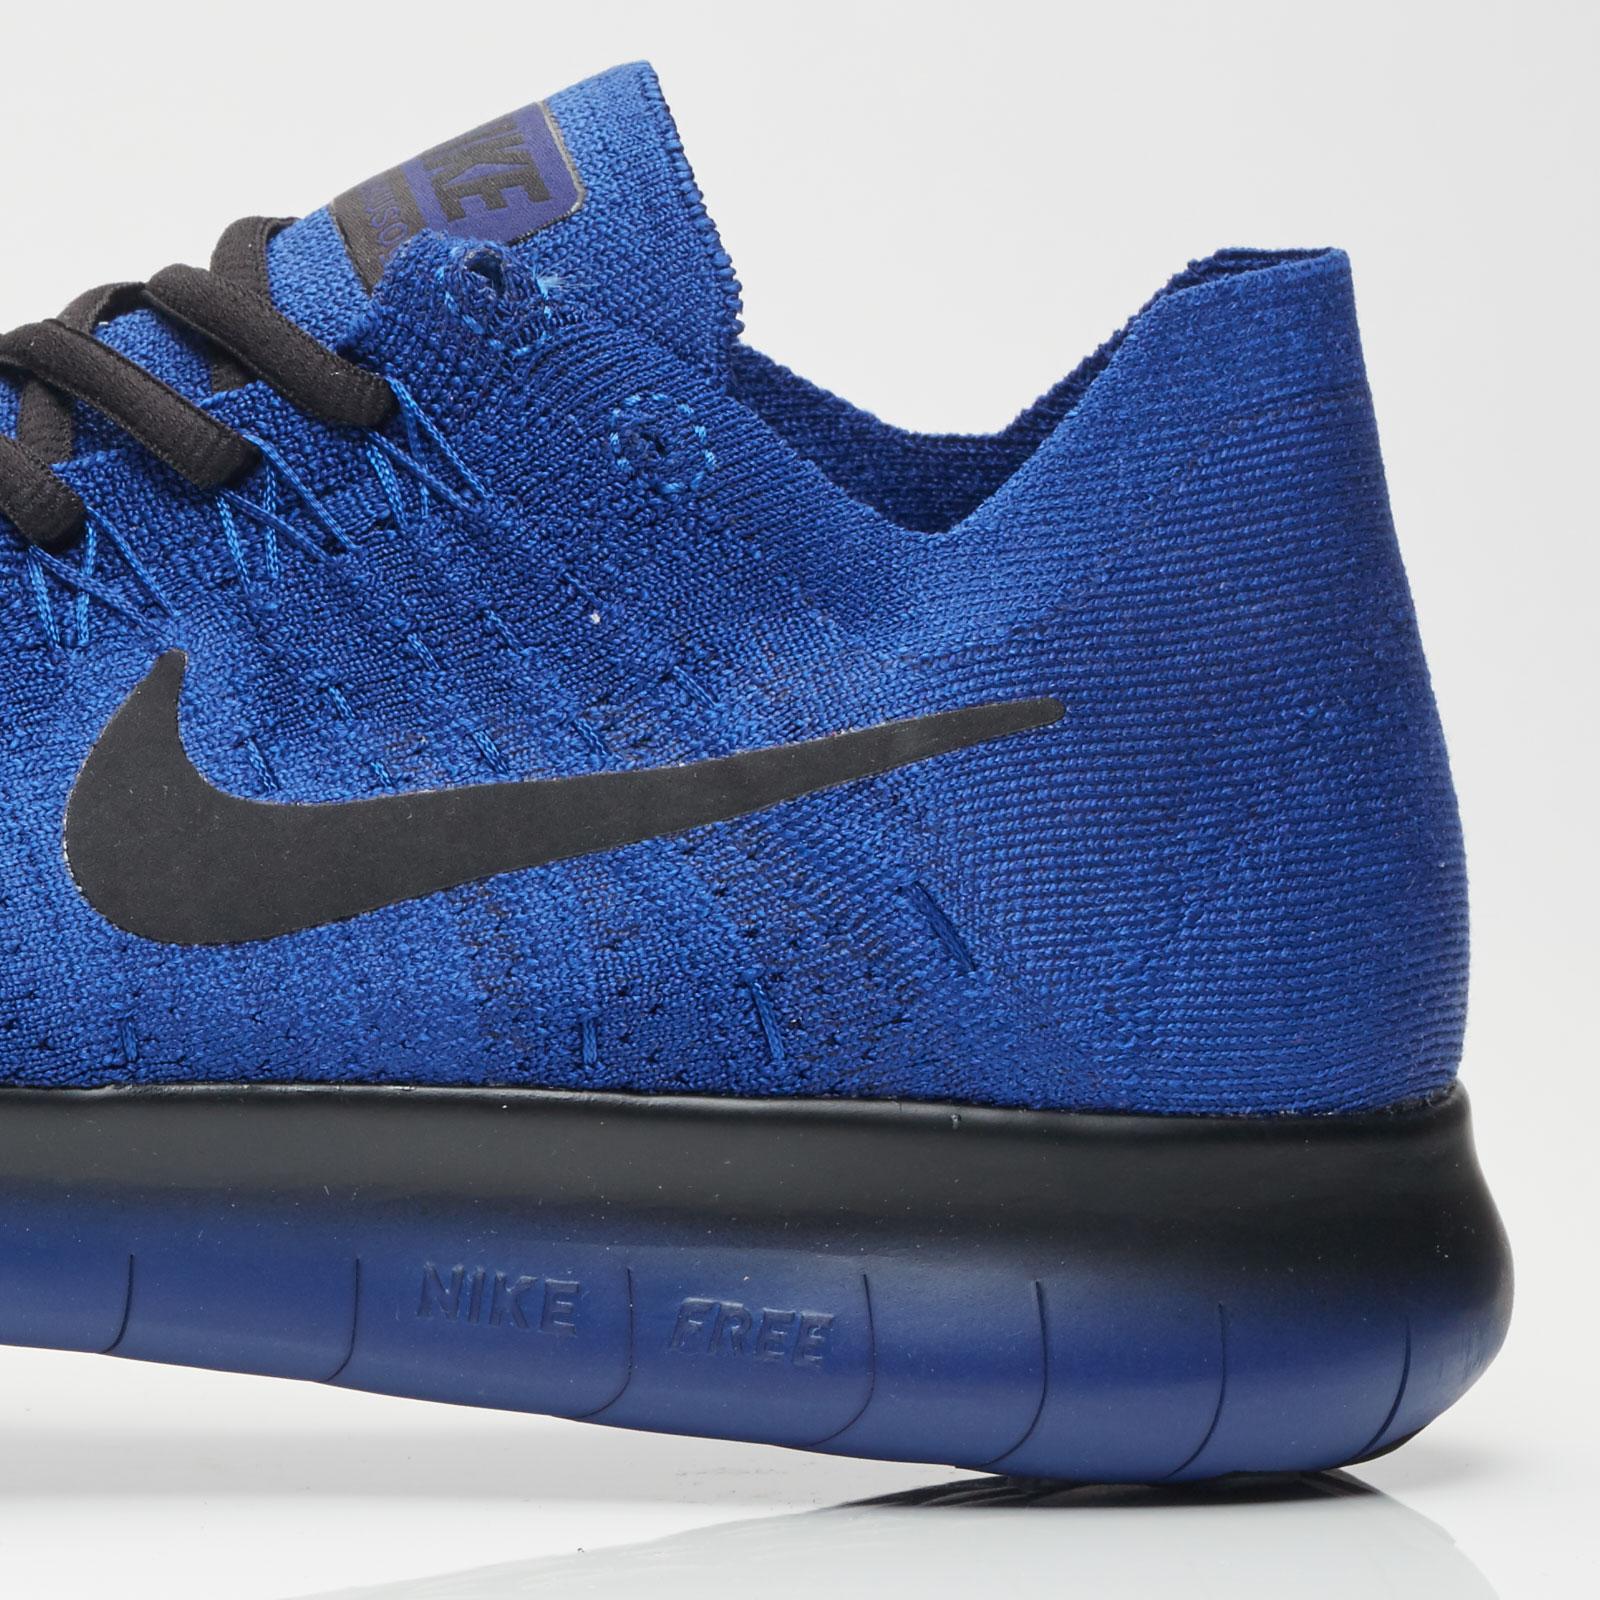 buy online aa26d d8e09 NikeLab Free Run Flyknit 2017 Gyakusou - 6. Close